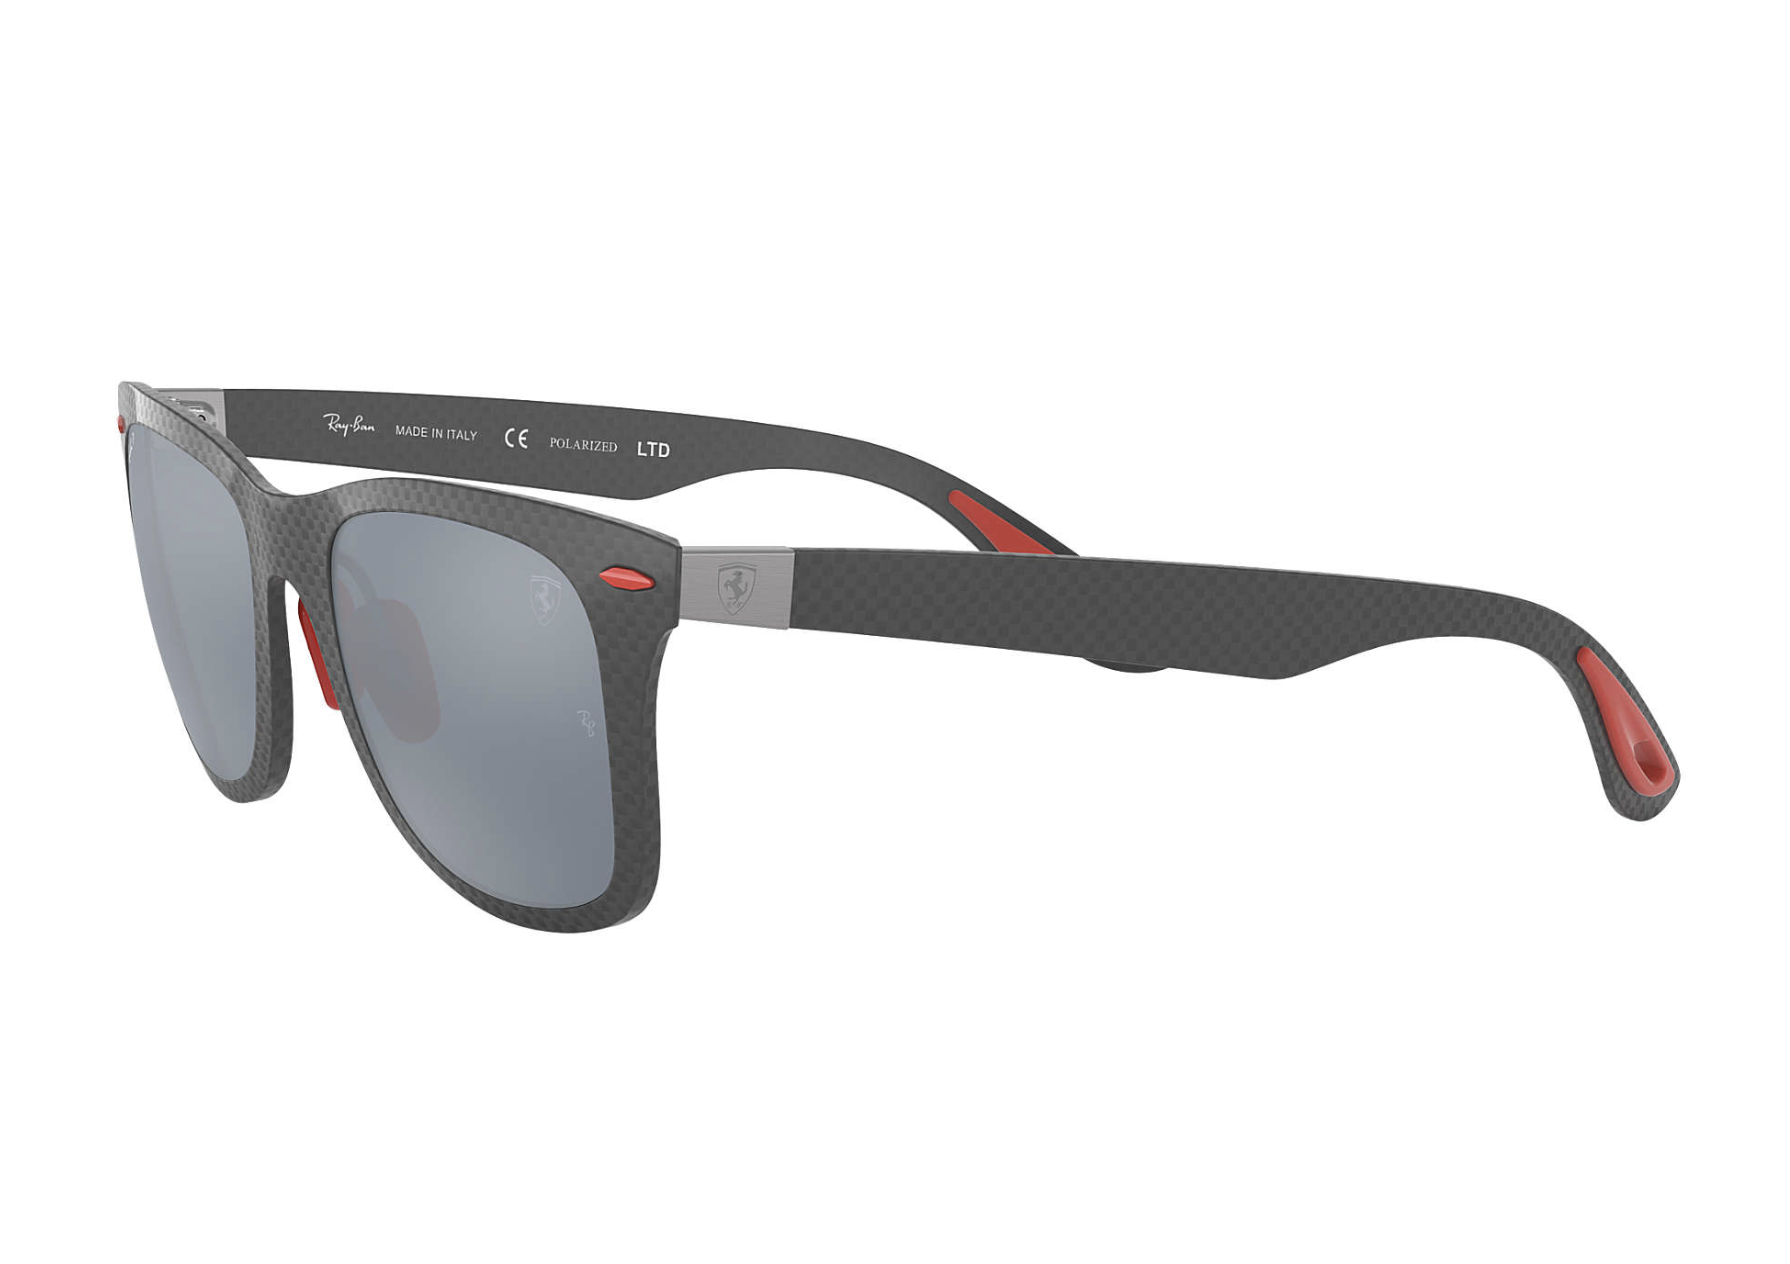 Scuderia Ferrari Monaco Limited Edition Sunglasses By Ray Ban Choice Gear